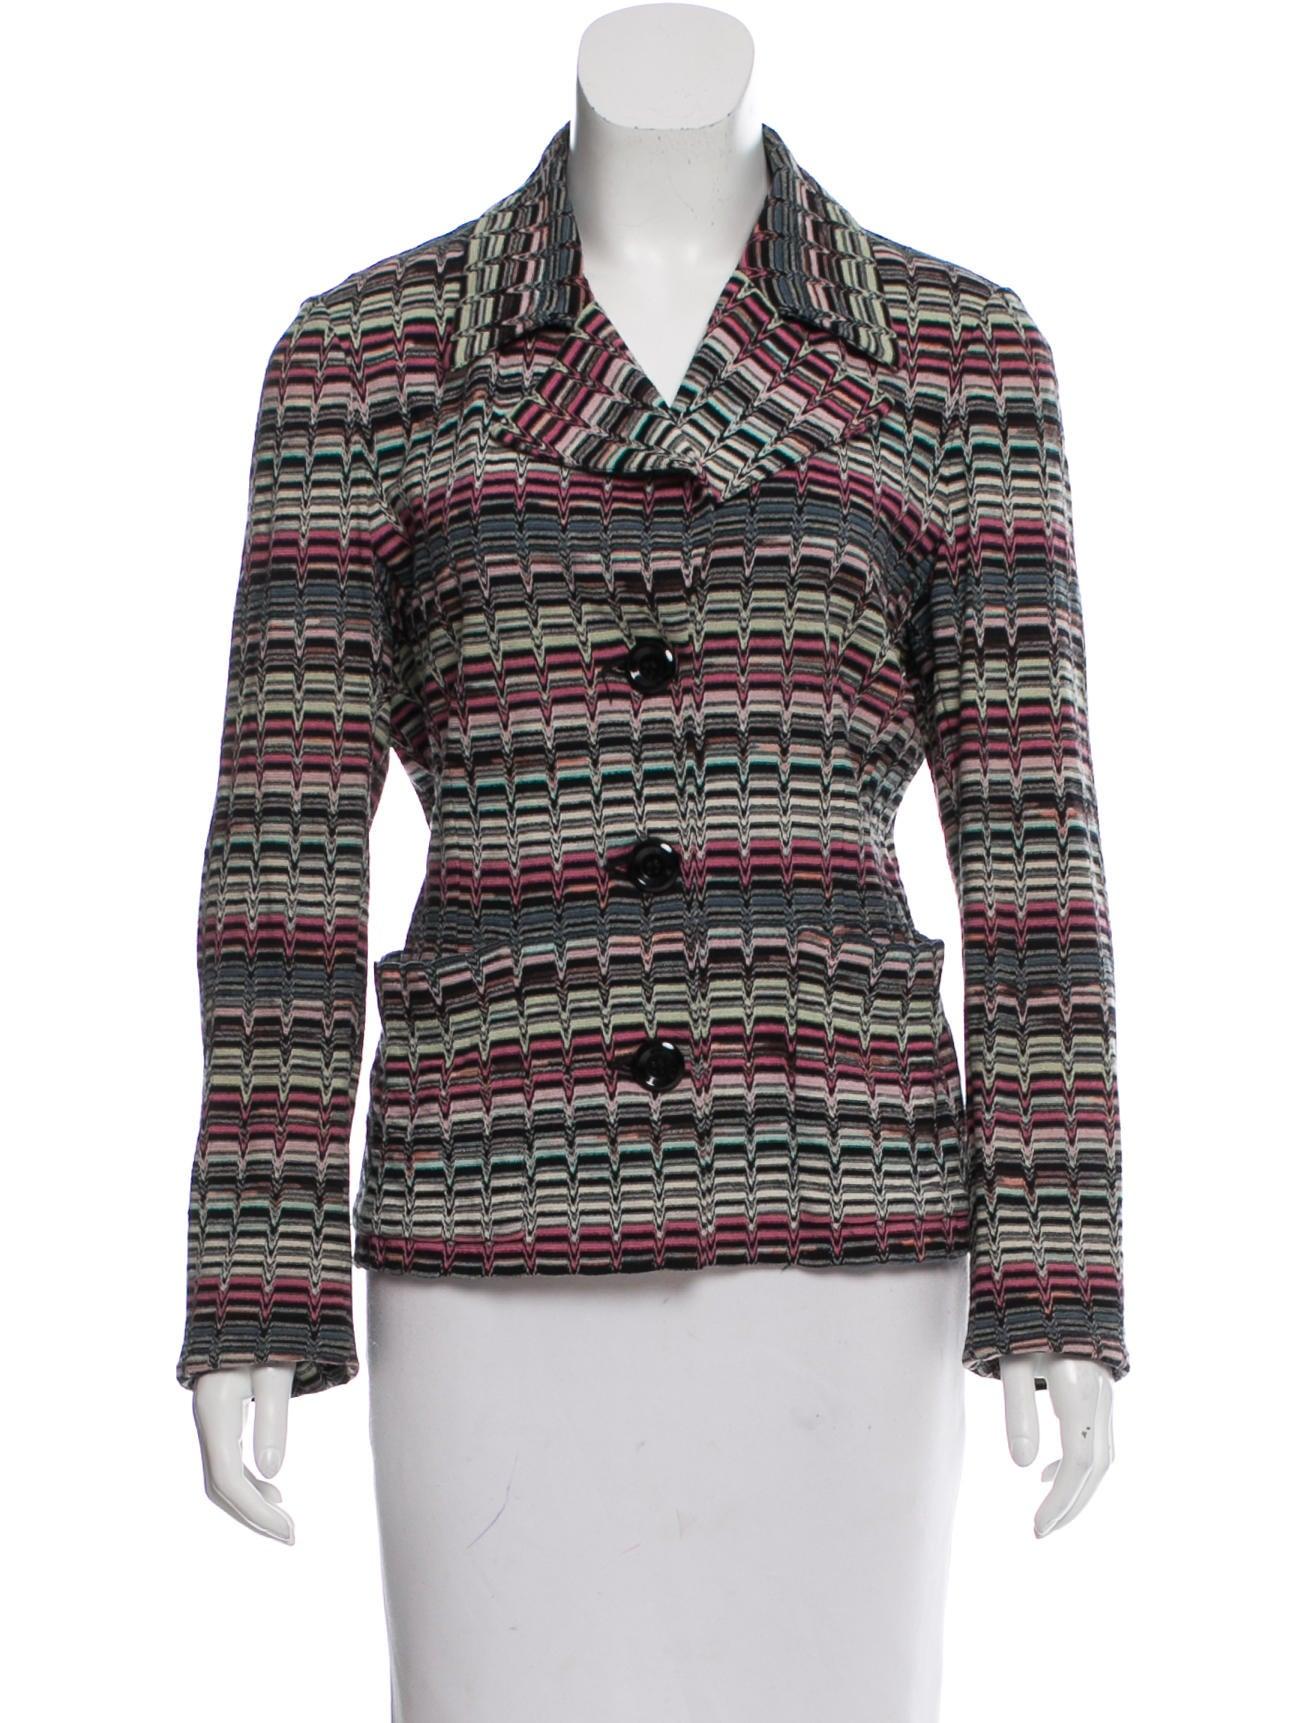 Denim Jacket Knitting Pattern : Missoni Pattern Knit Jacket - Clothing - MIS41815 The RealReal